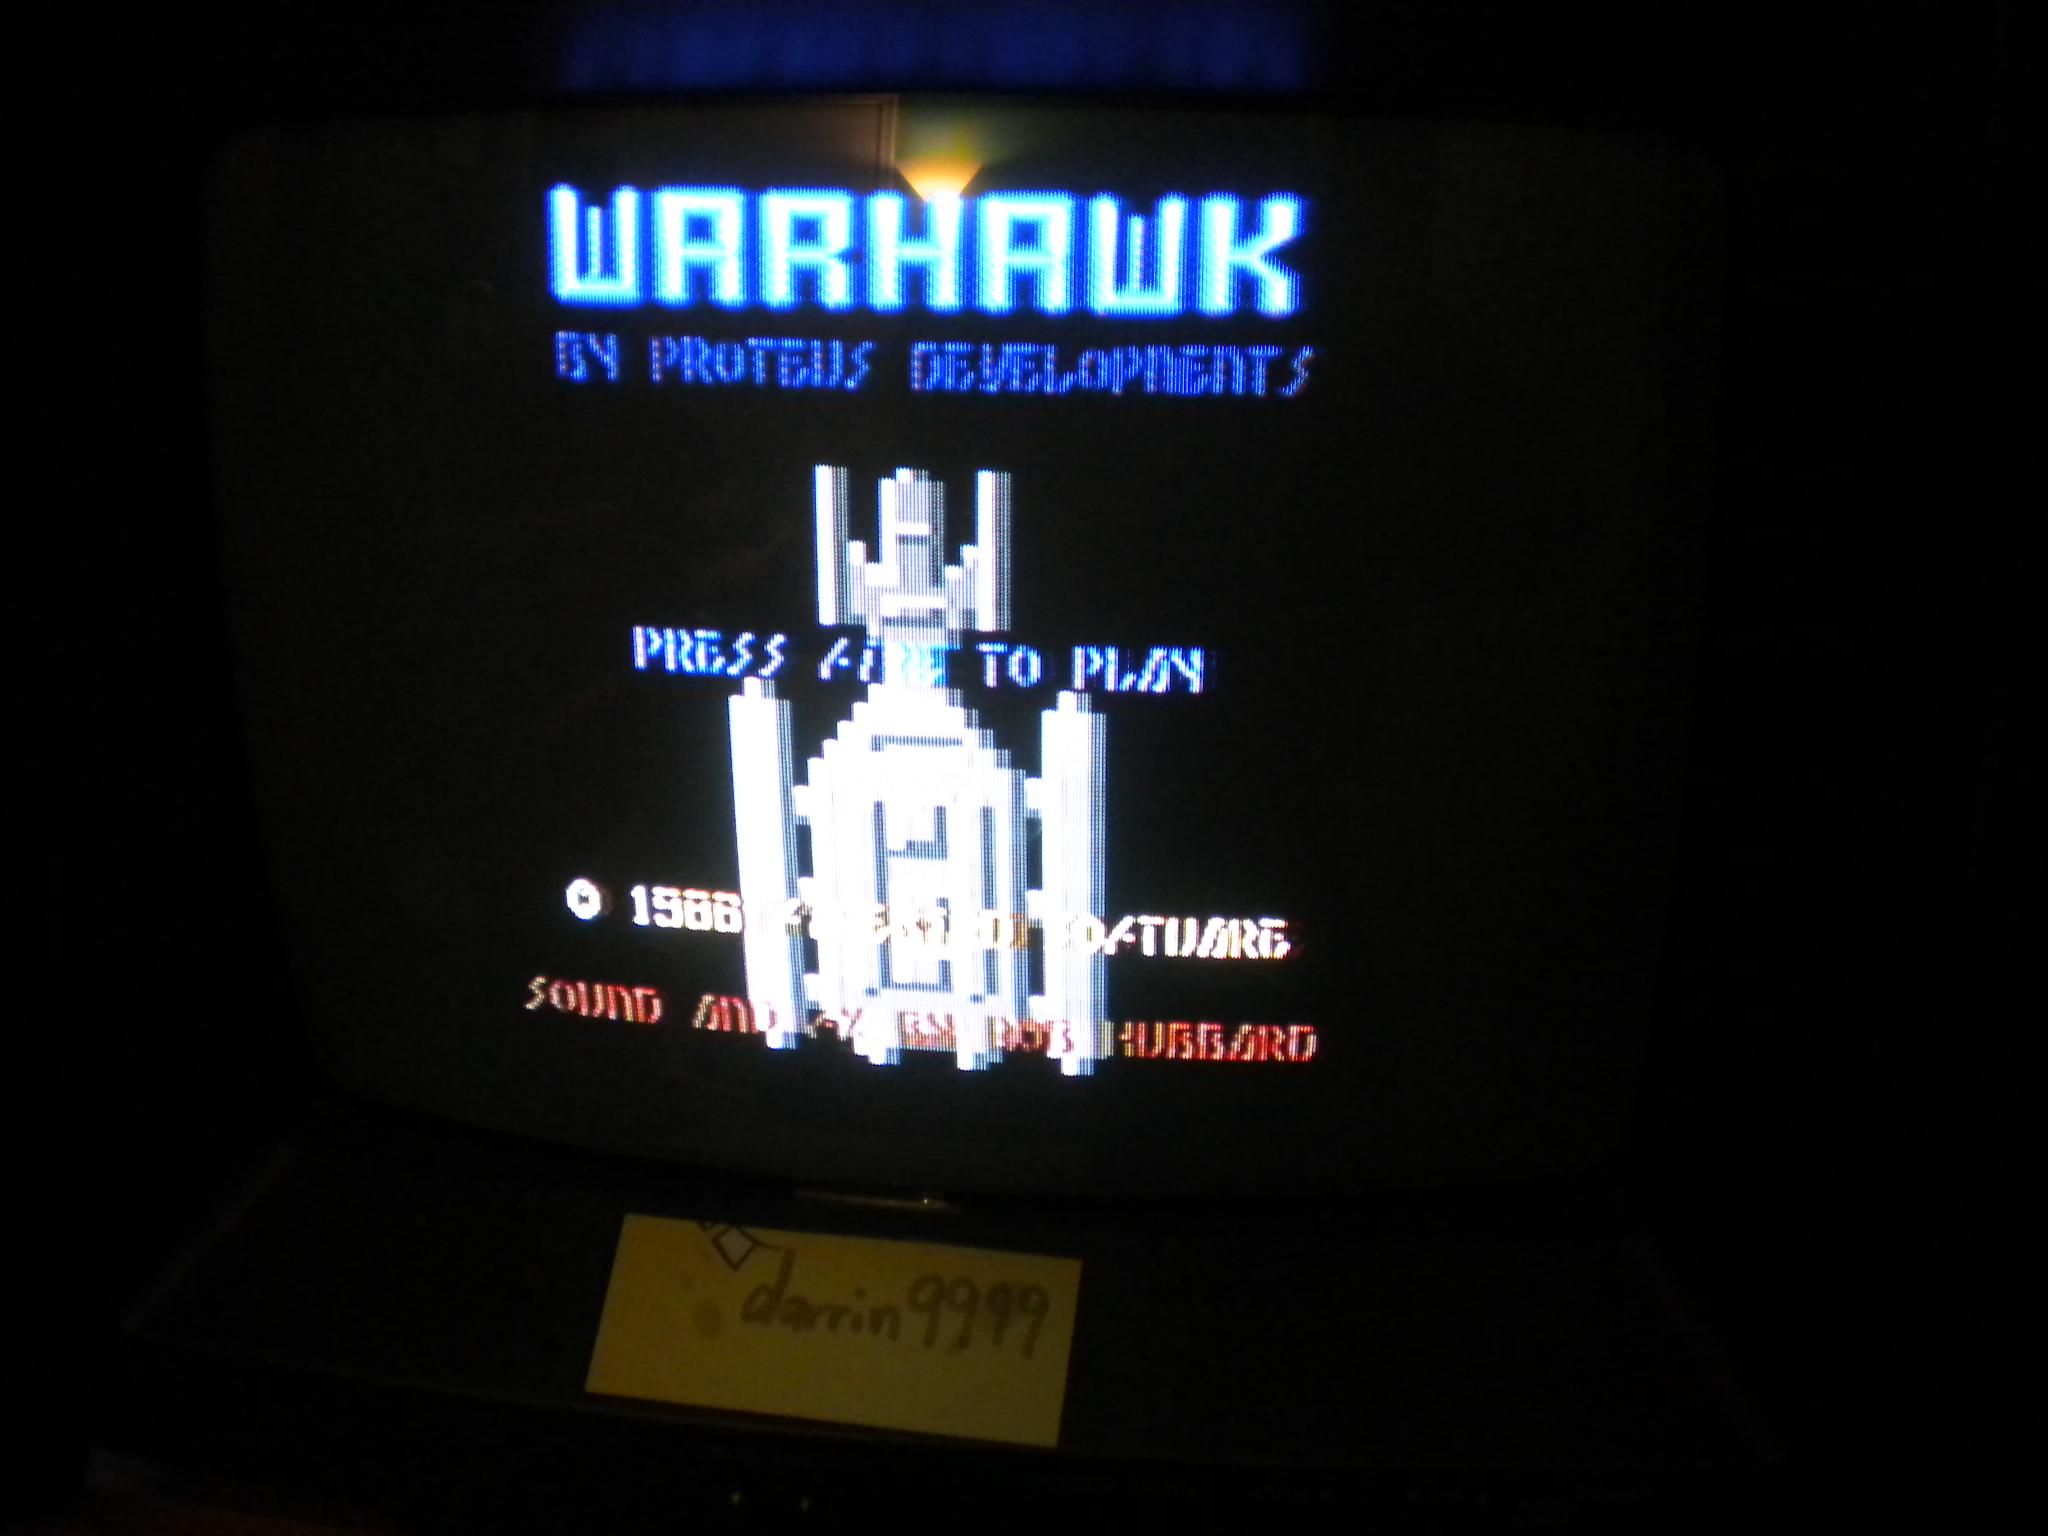 Warhawk 28,151 points